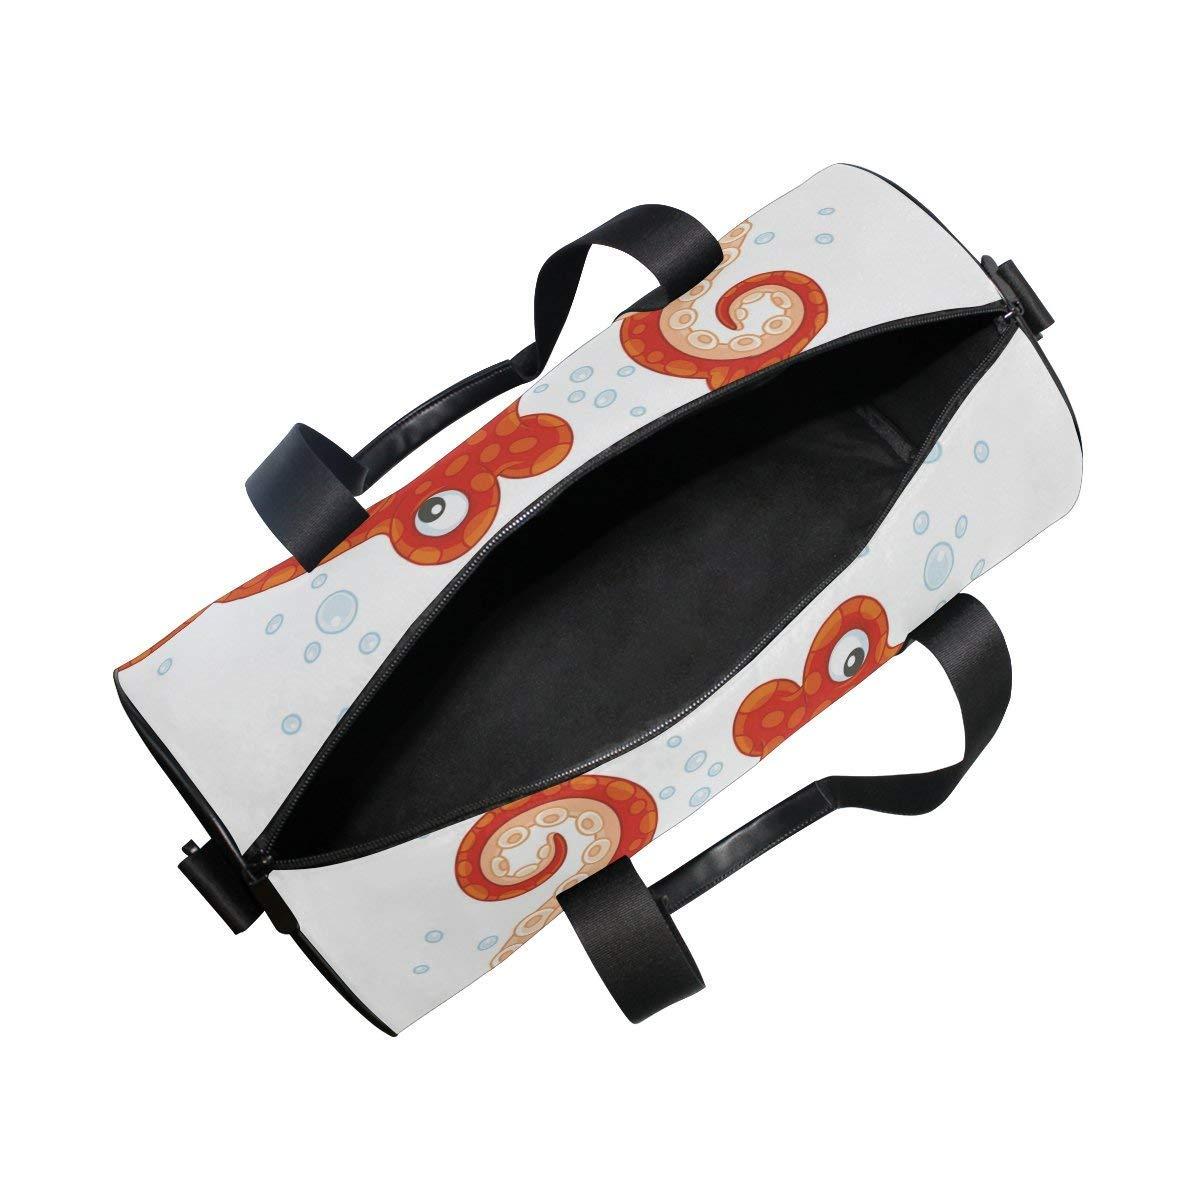 OuLian Gym Duffel Bag Octopus Sports Lightweight Canvas Travel Luggage Bag